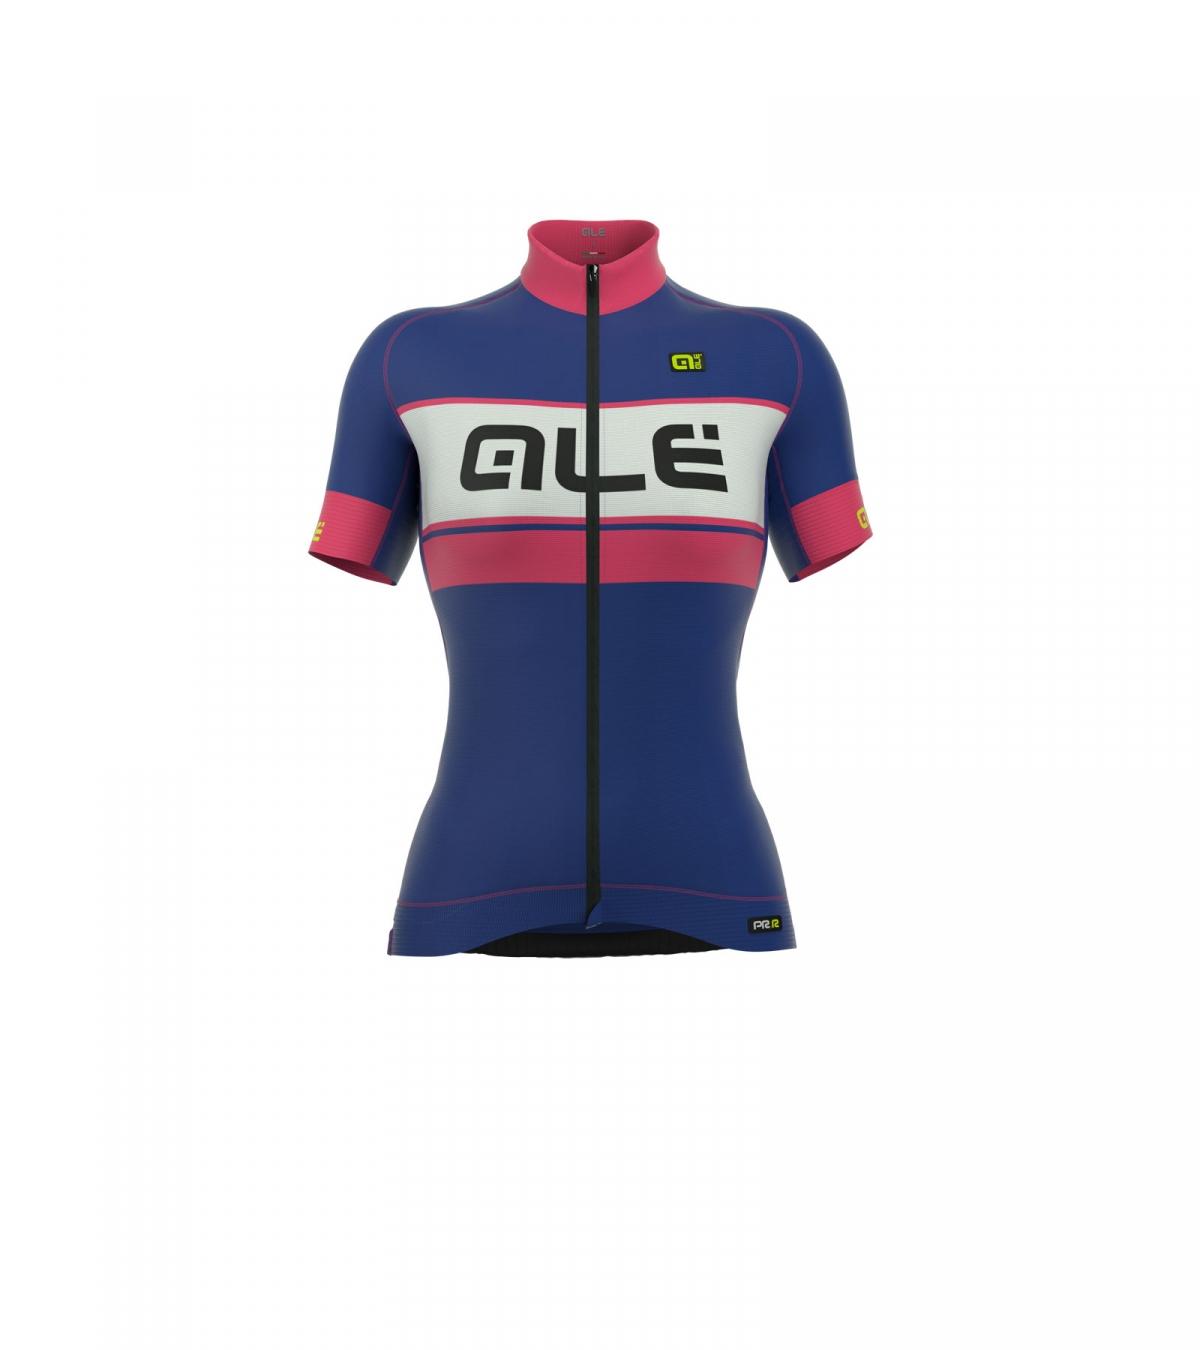 L17354316-Graphics-PRR-women-bermuda-jersey-blue-pink-fluo-front_1200_1350